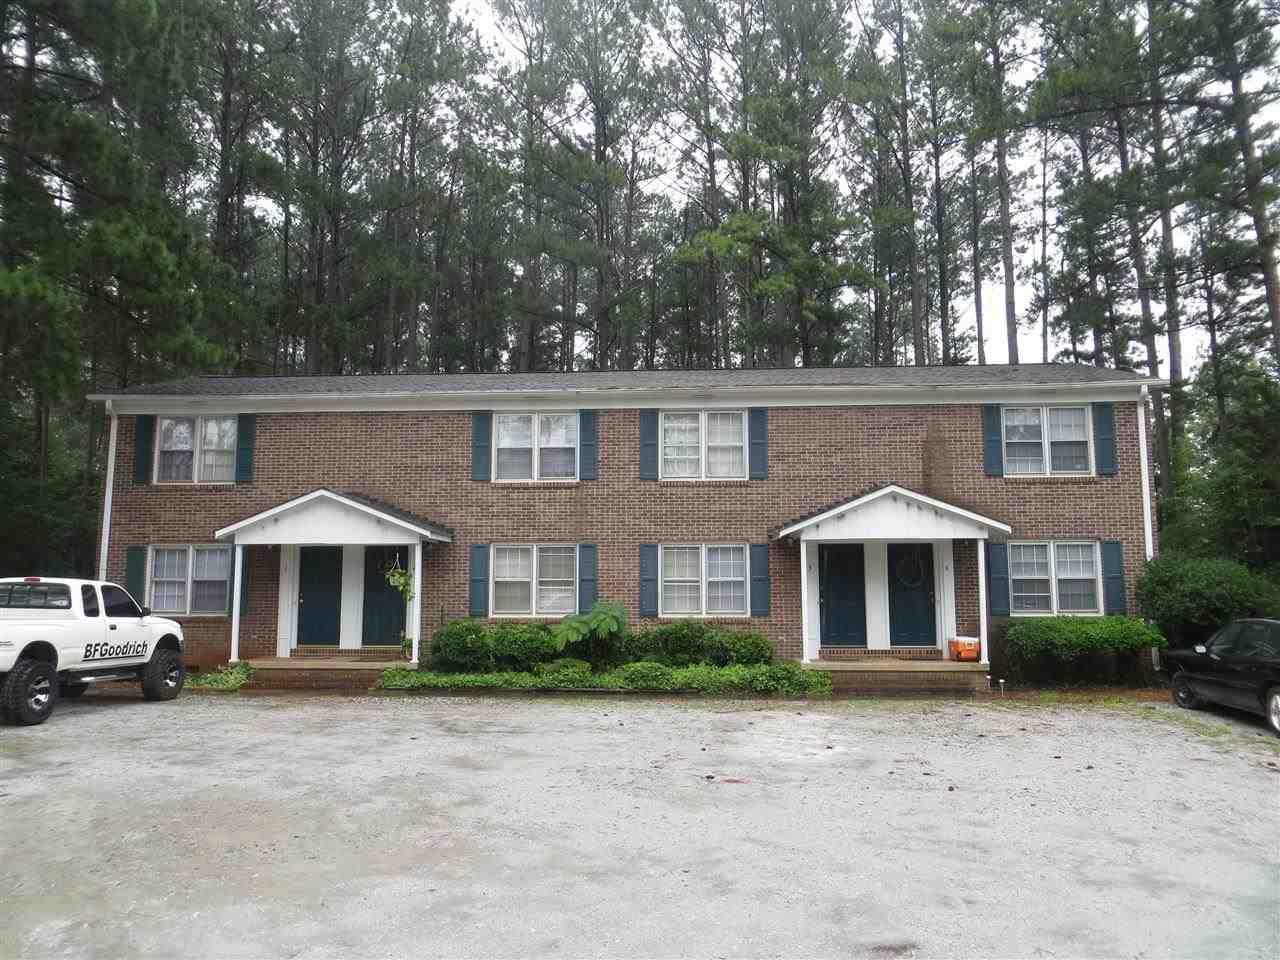 Rental Homes for Rent, ListingId:29585978, location: 221 Stork Way #2 Seneca 29678